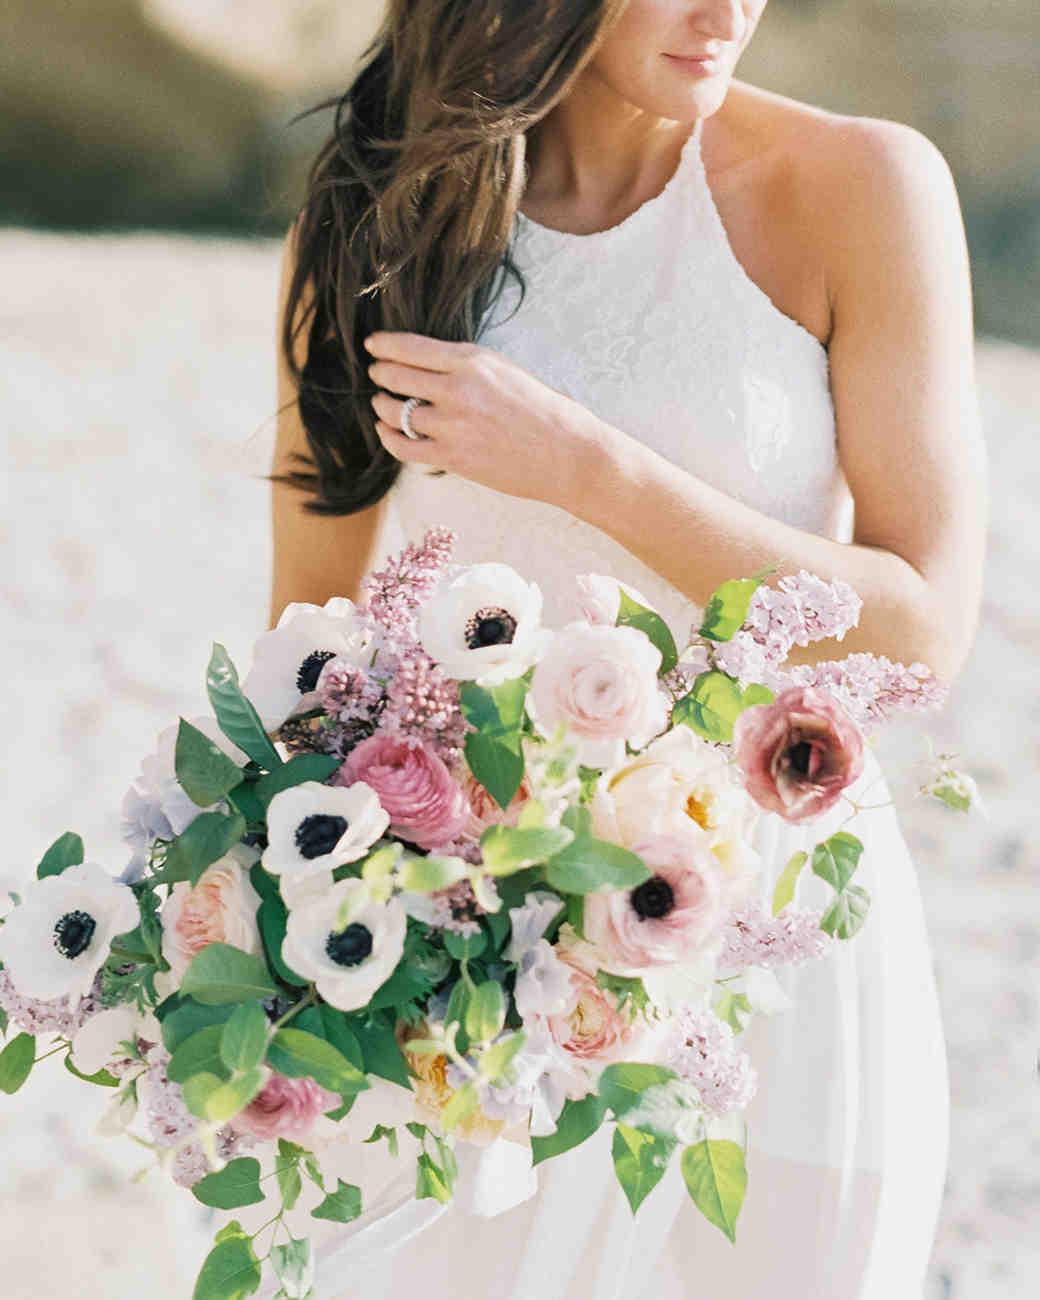 25 anemone wedding bouquets for every type of bride martha stewart anemone bouquets luna de mare izmirmasajfo